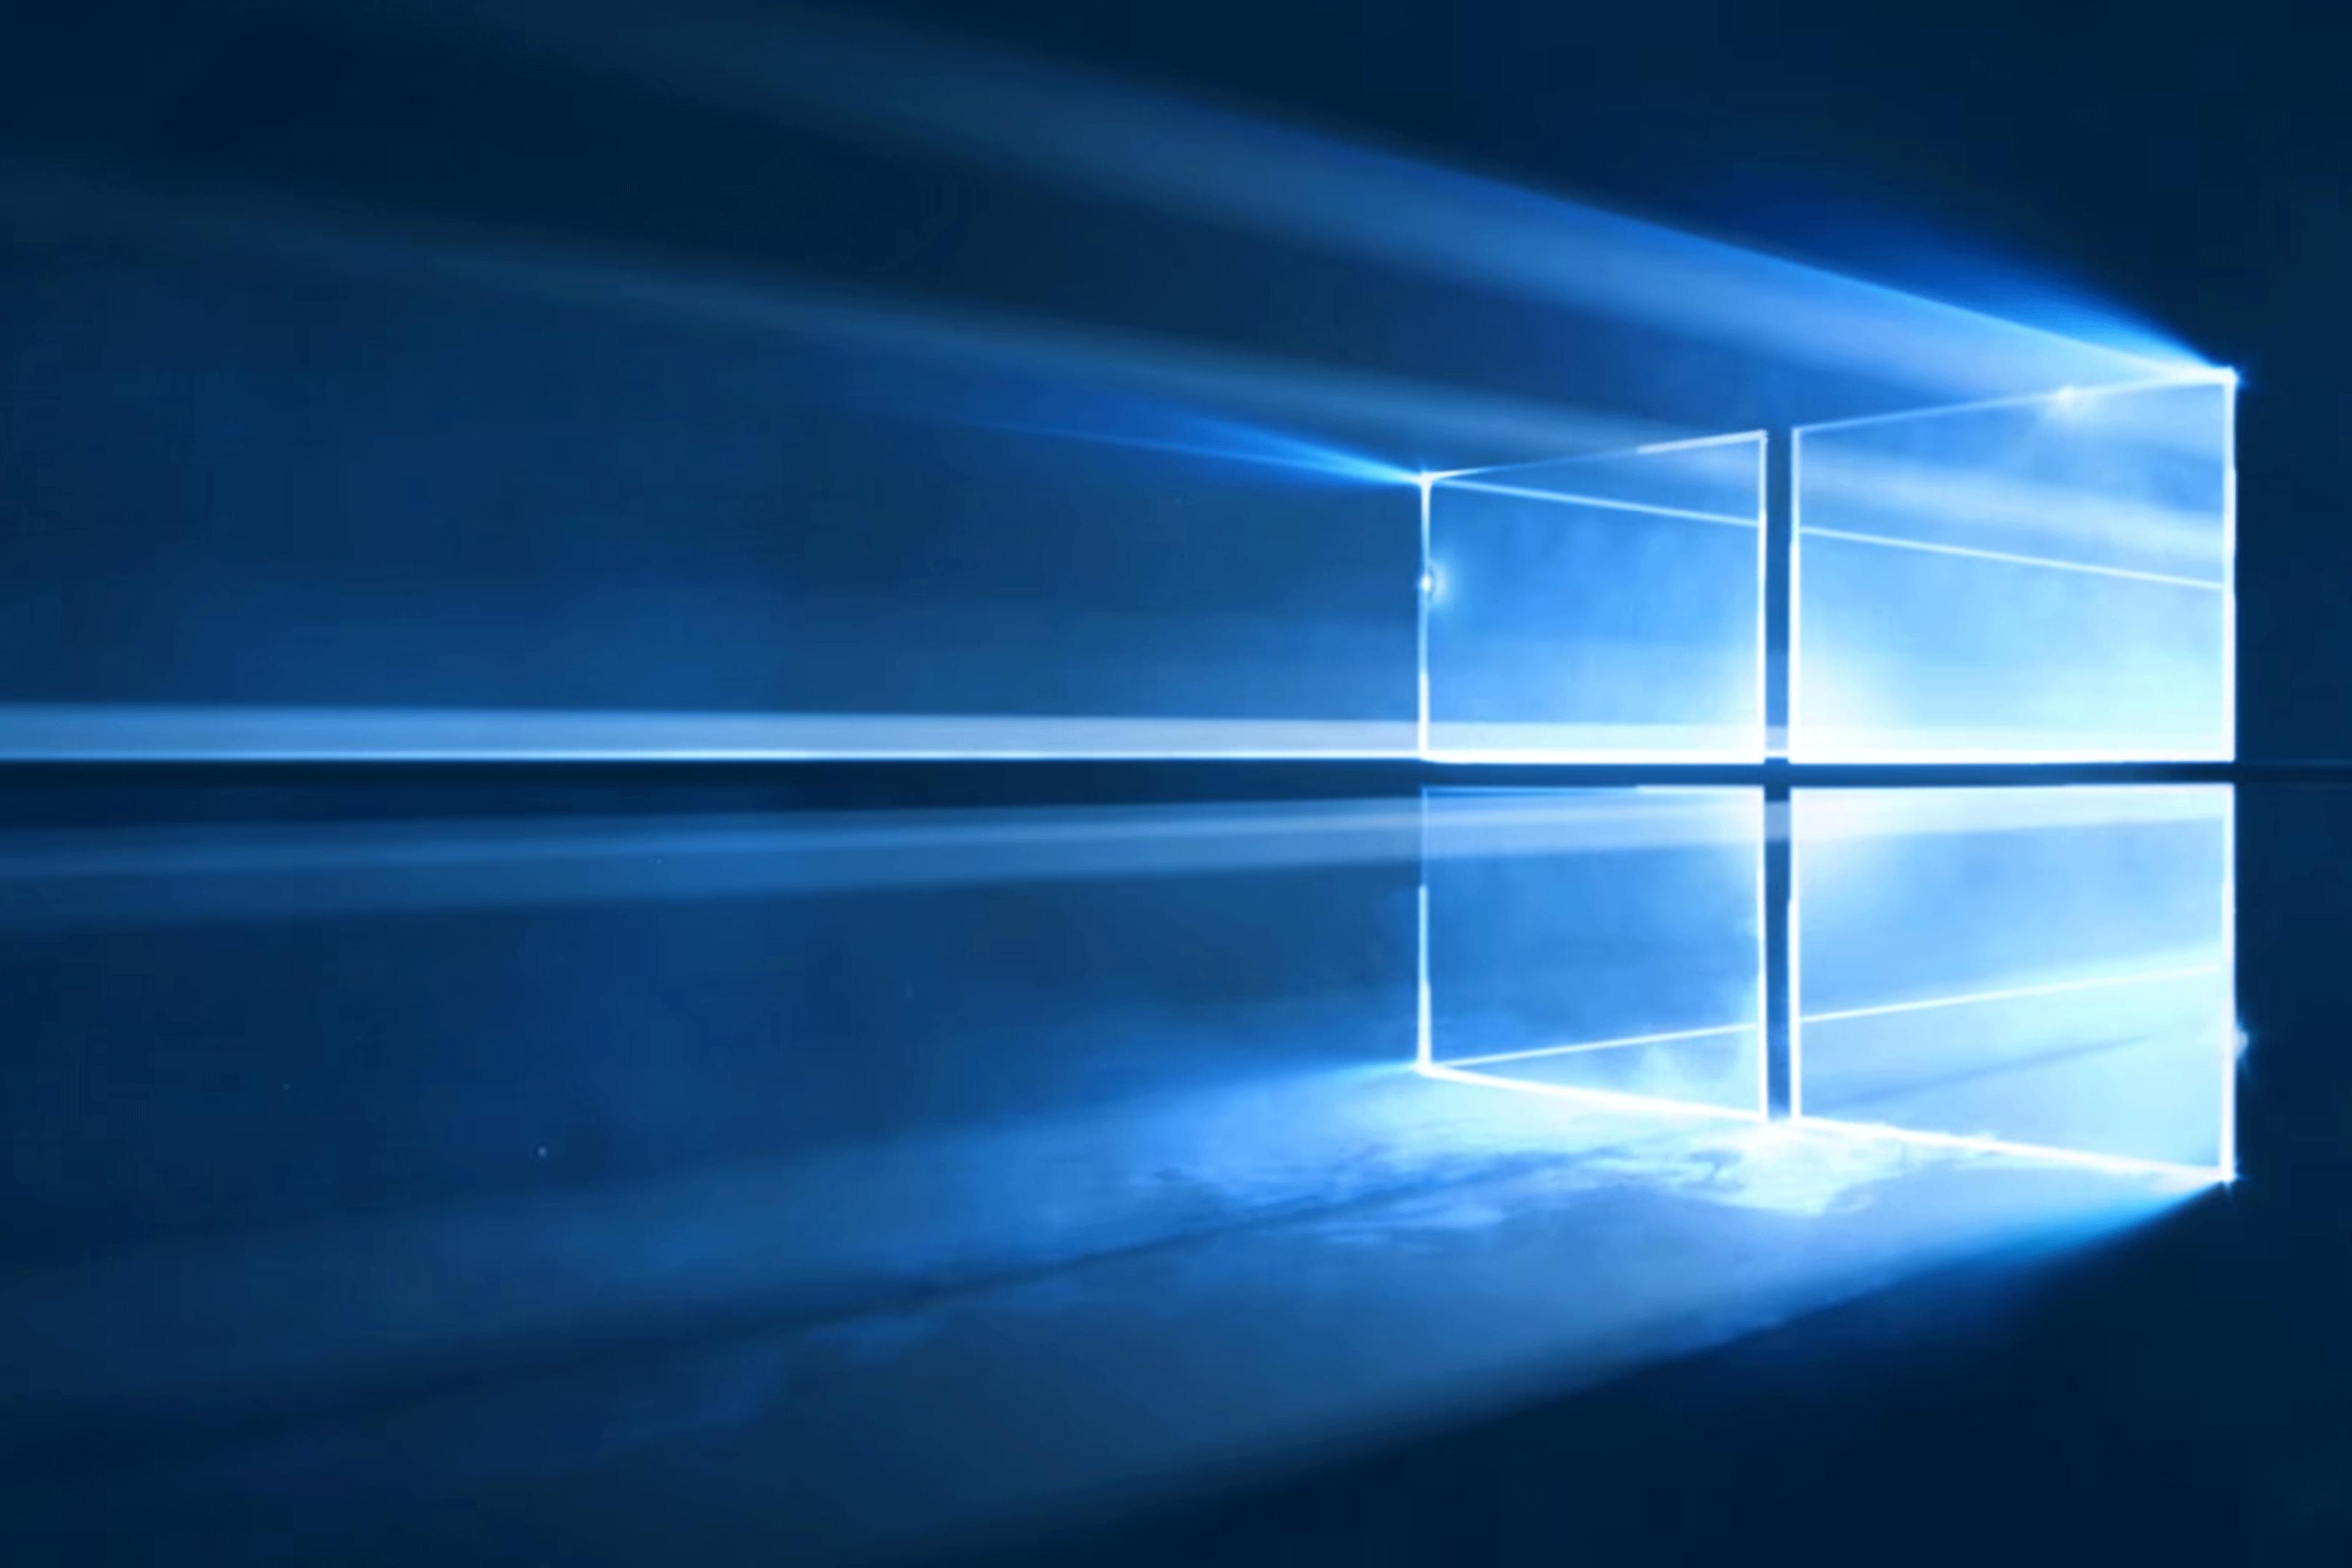 Windows10Hero 3240x2160